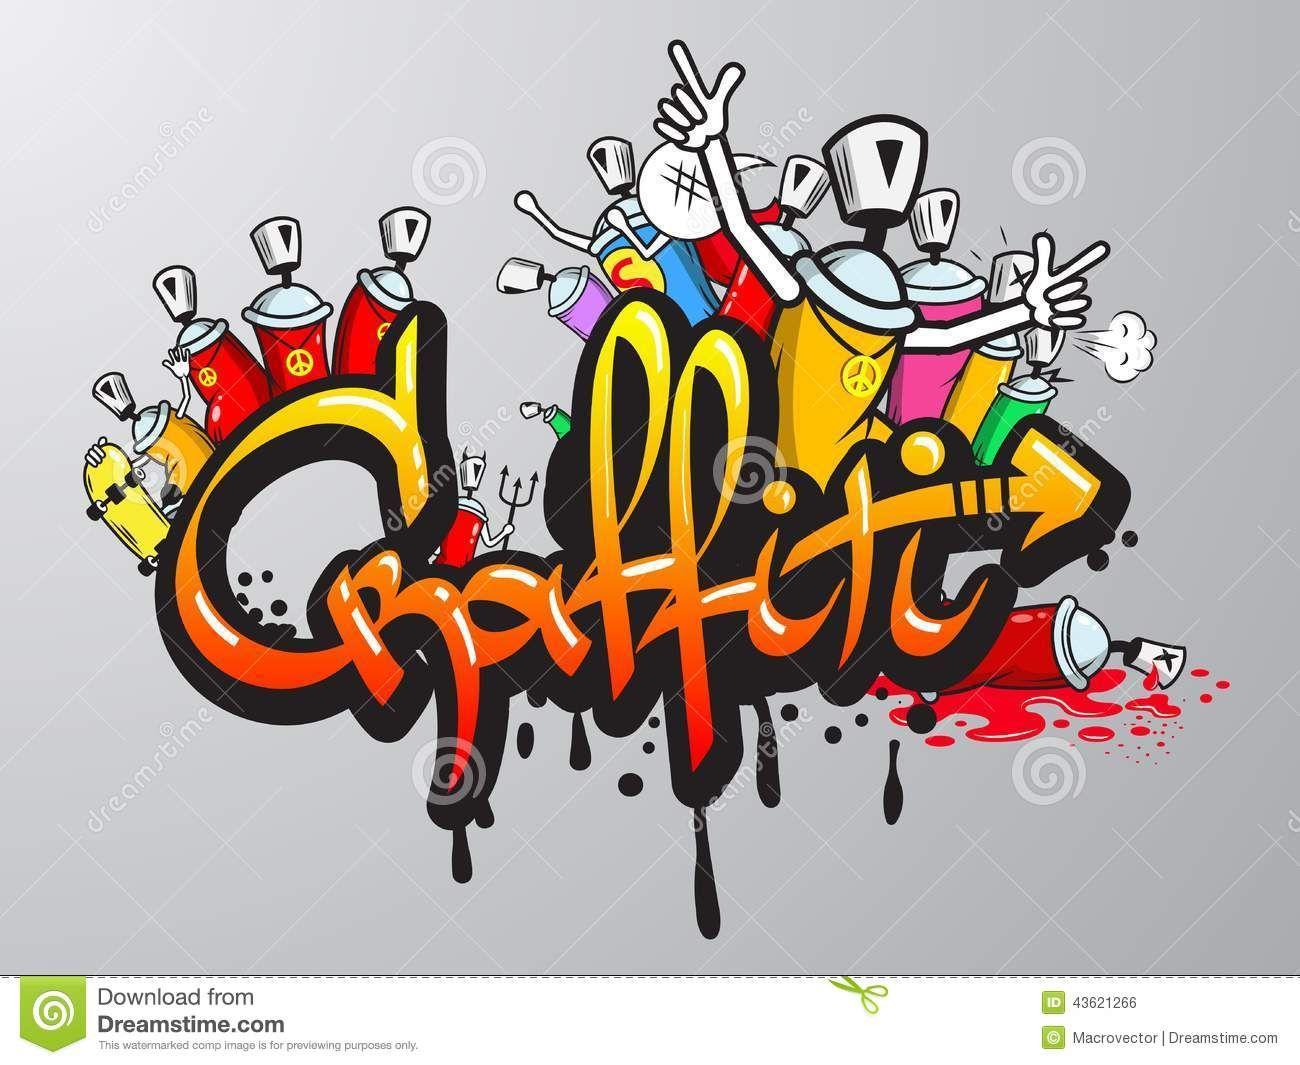 the word graffiti in graffiti